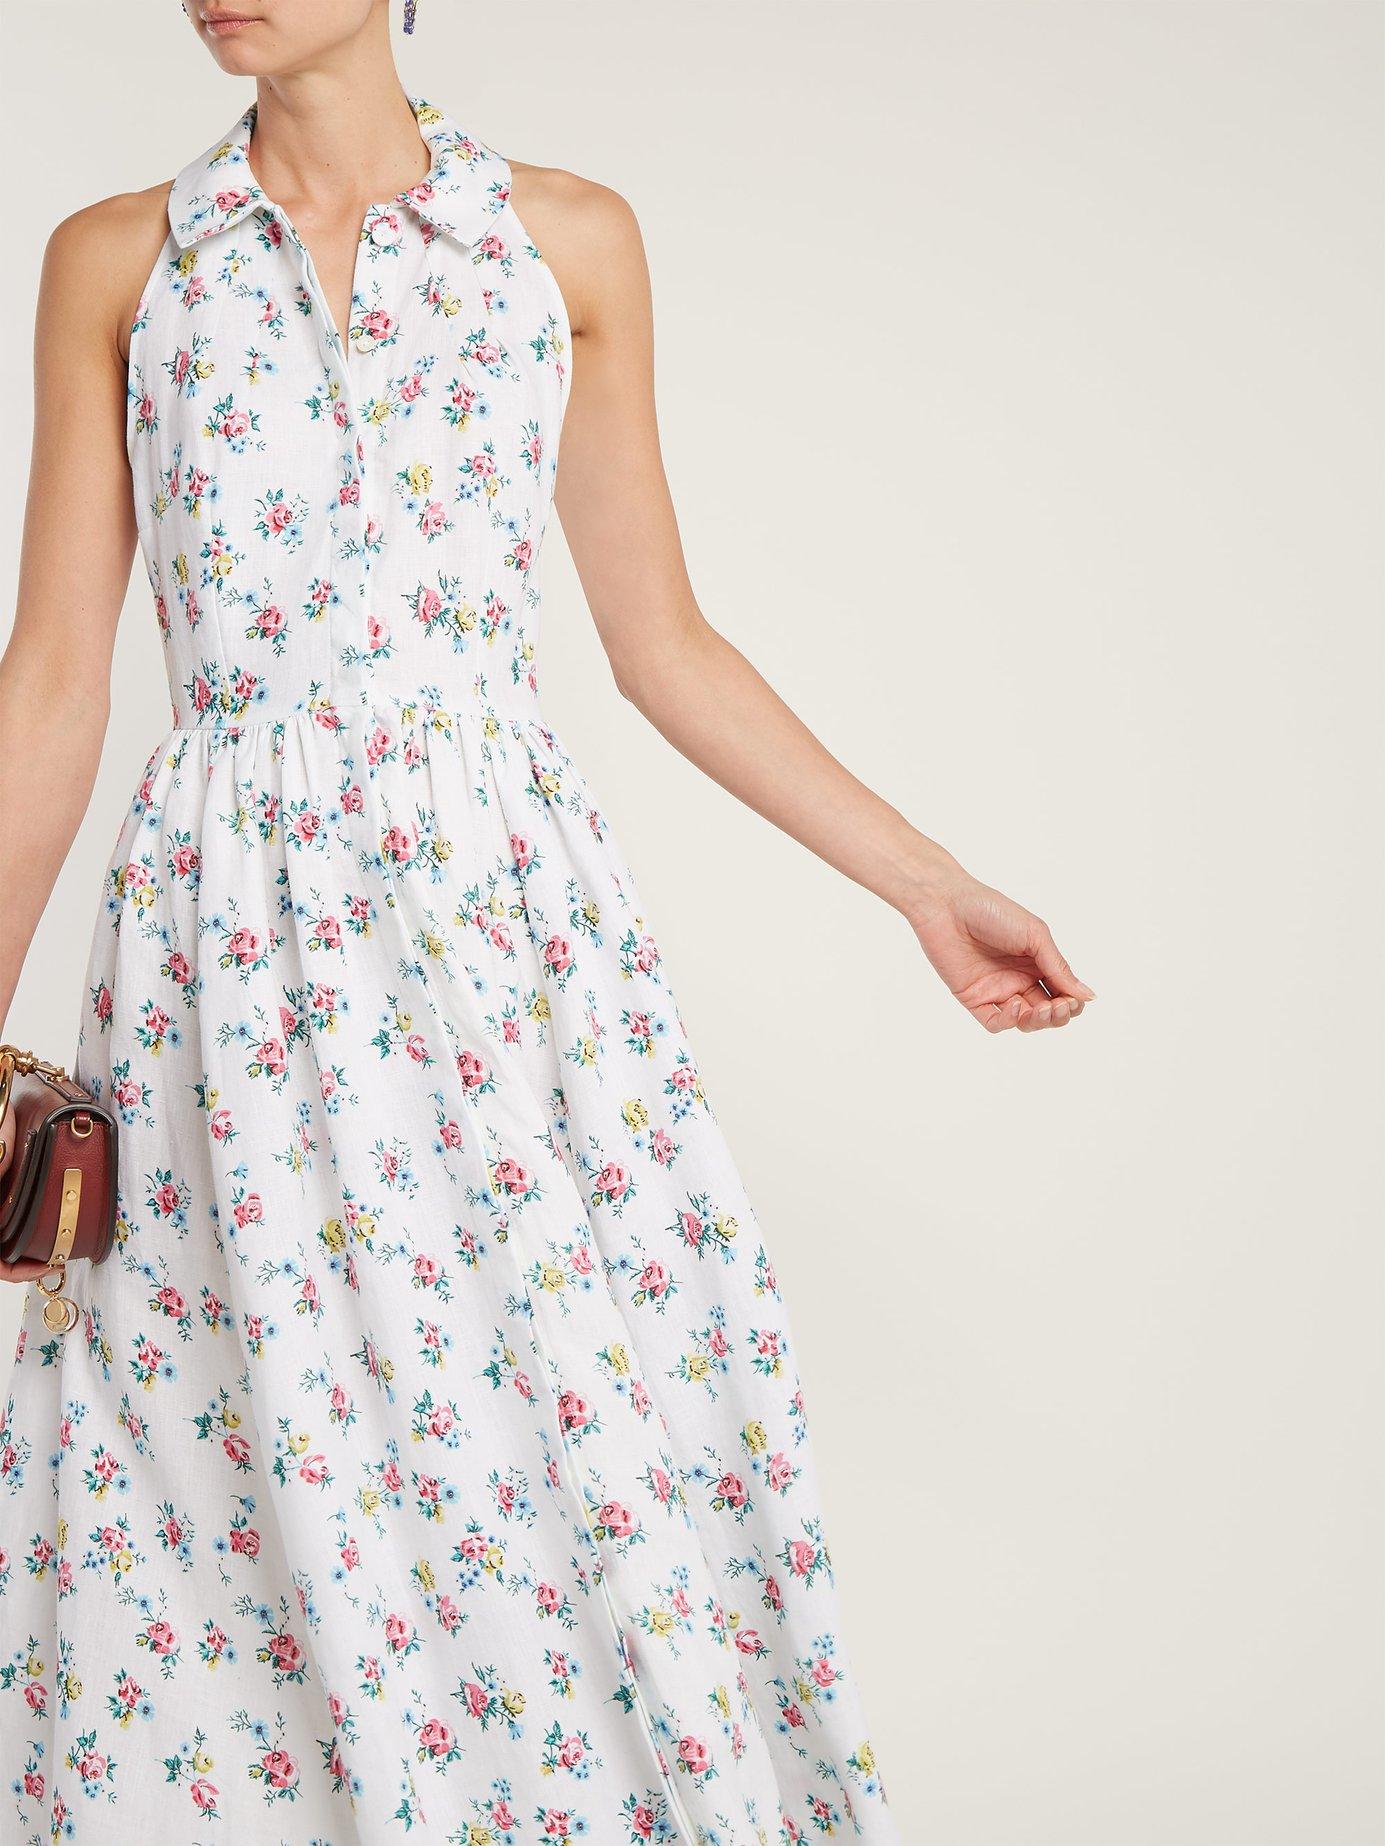 Norika floral-print linen shirtdress by Emilia Wickstead